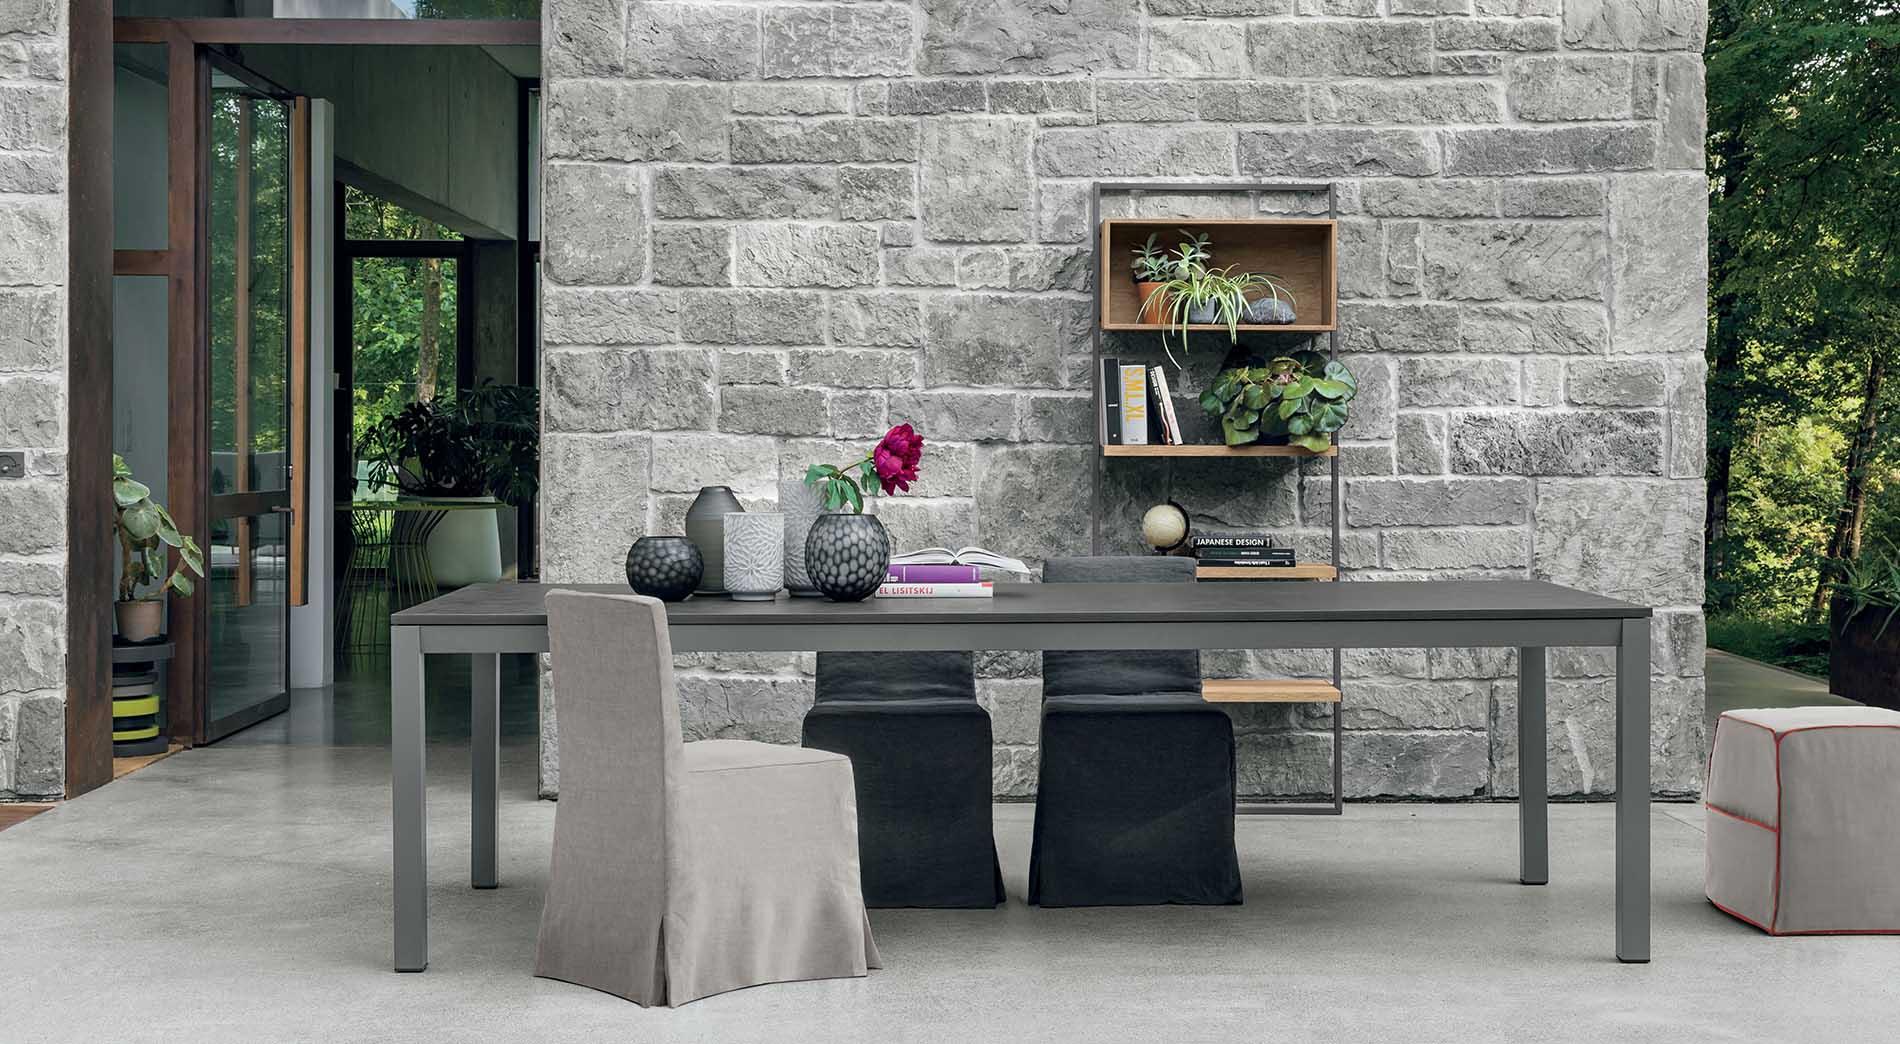 Awesome tavoli allungabili design contemporary for Tavoli outlet design